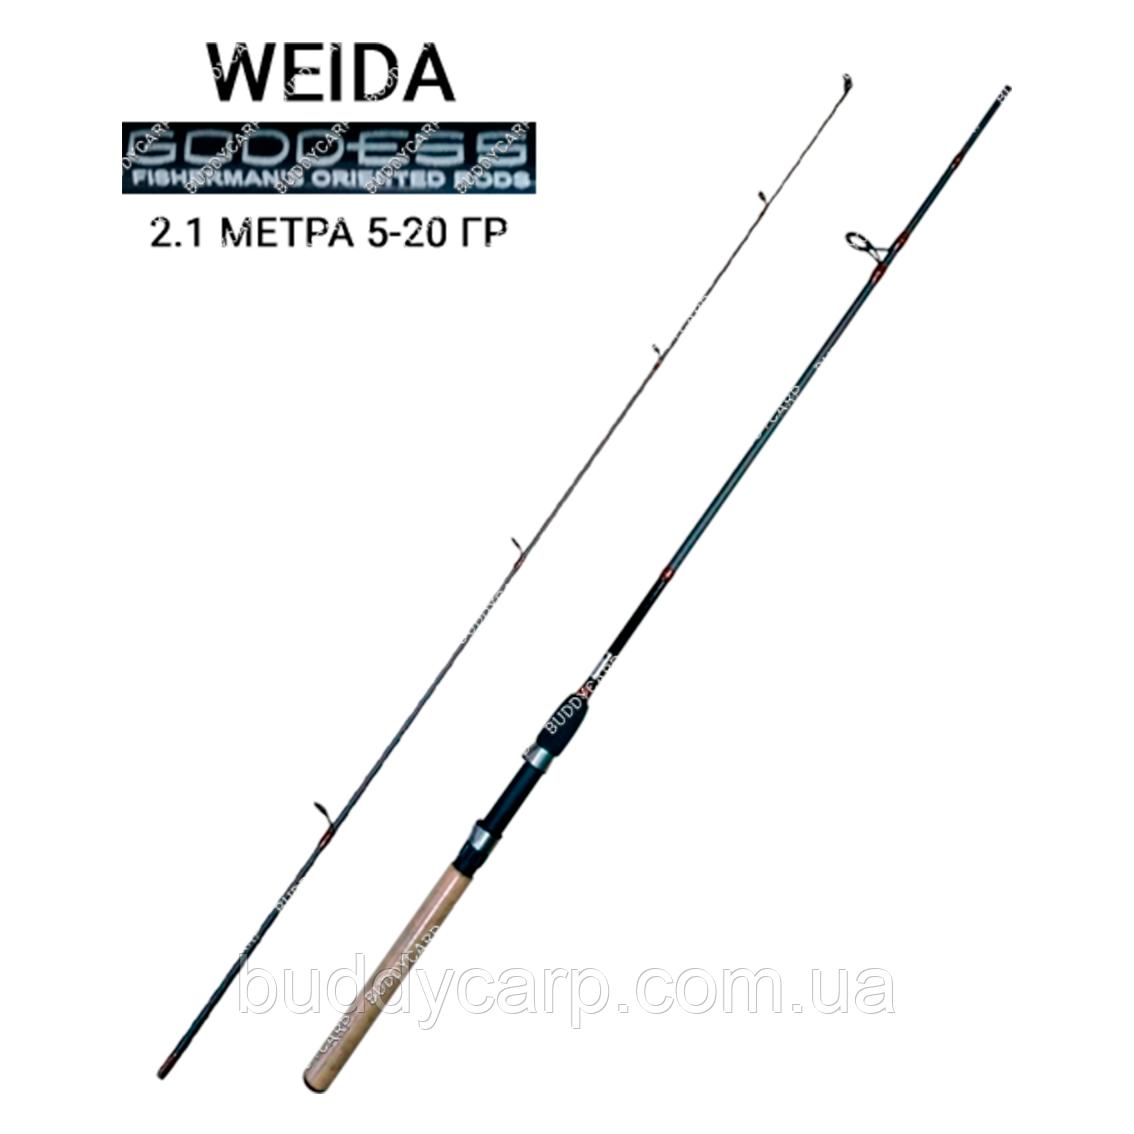 Спиннинг 2.1 метра тест 5-20 гр Goddess Weida (Kaida)